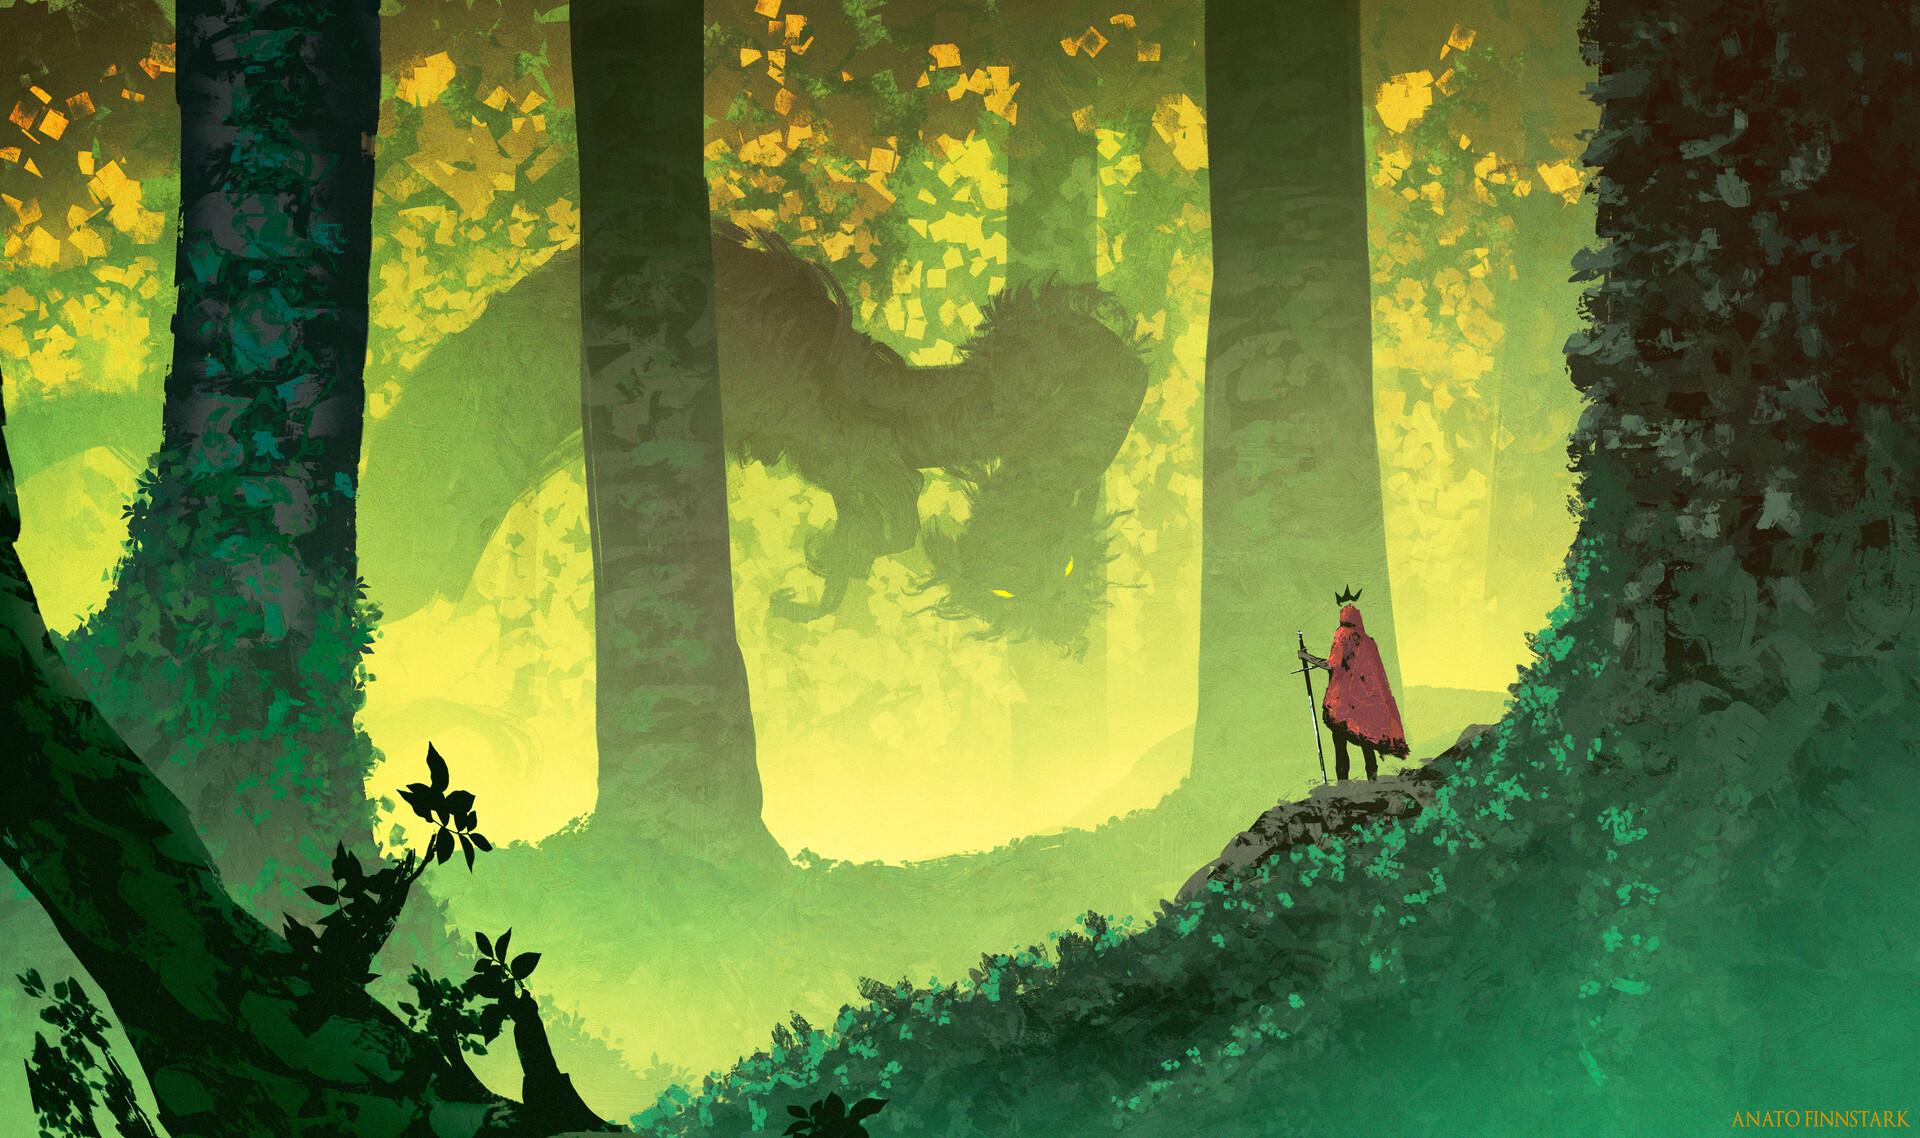 Anato finnstark the king s journey the forest s guardian by anatofinnstark dcy2tc8 fullview